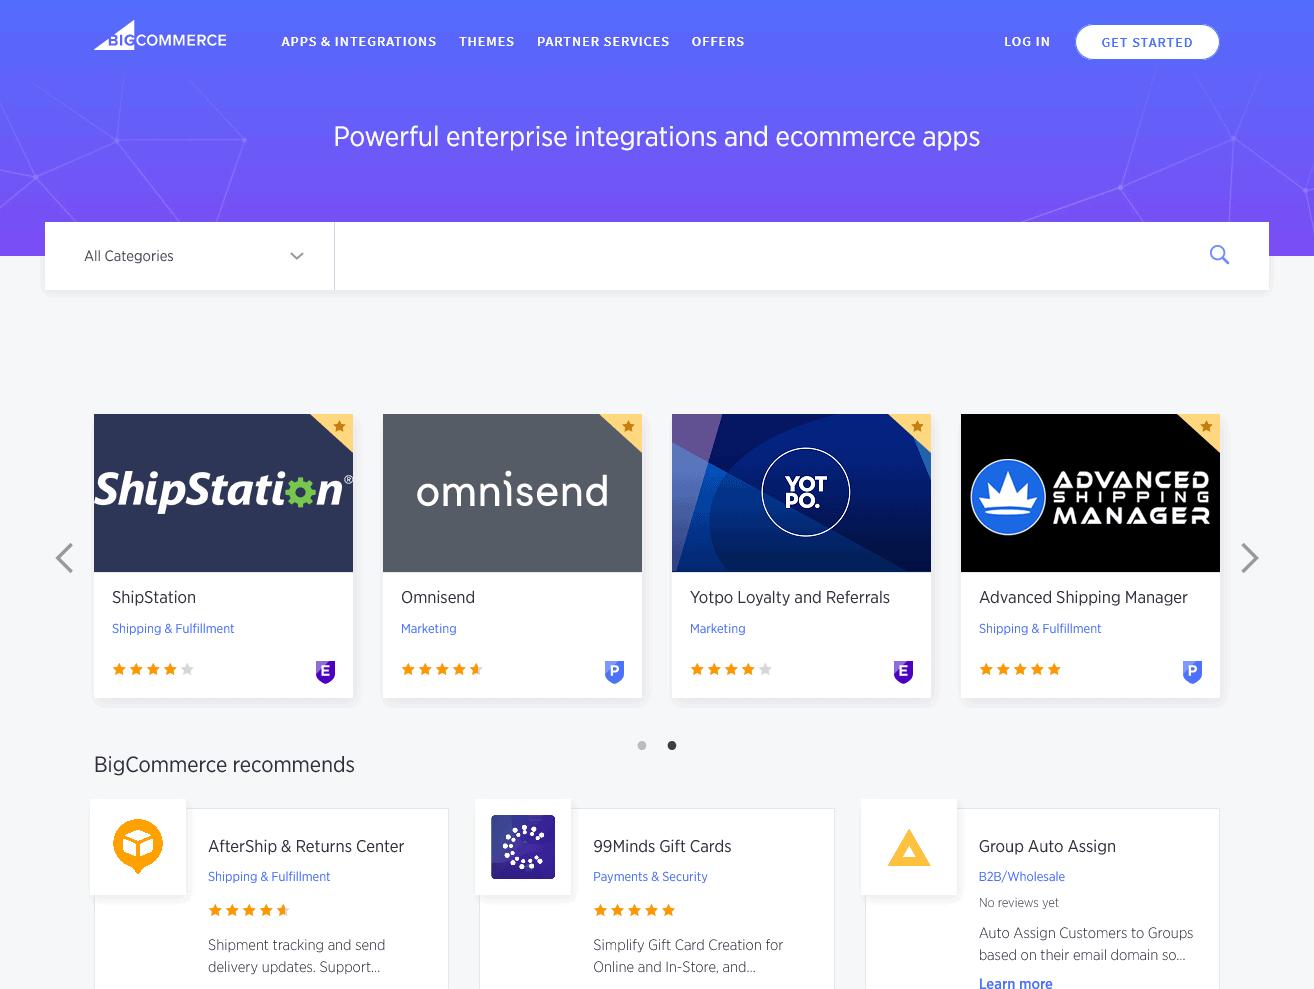 The BigCommerce App Store